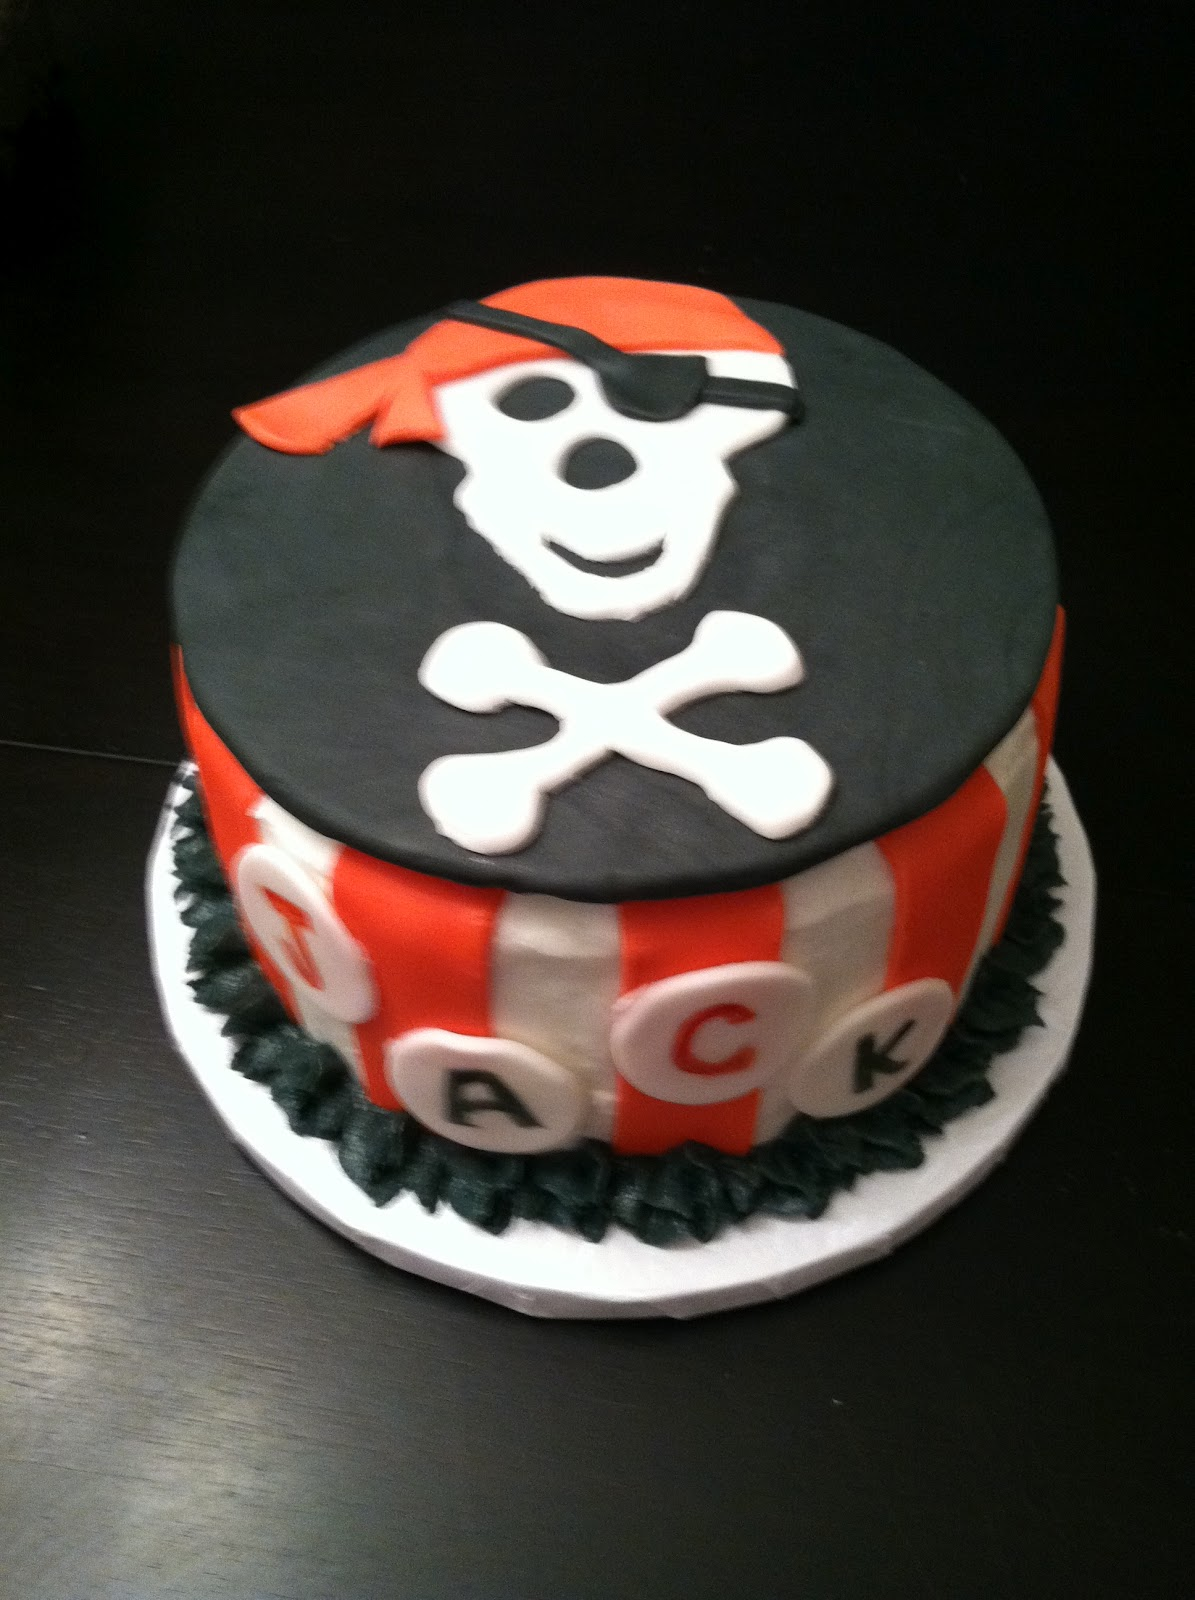 Strange Pirate Cakes Decoration Ideas Little Birthday Cakes Funny Birthday Cards Online Kookostrdamsfinfo